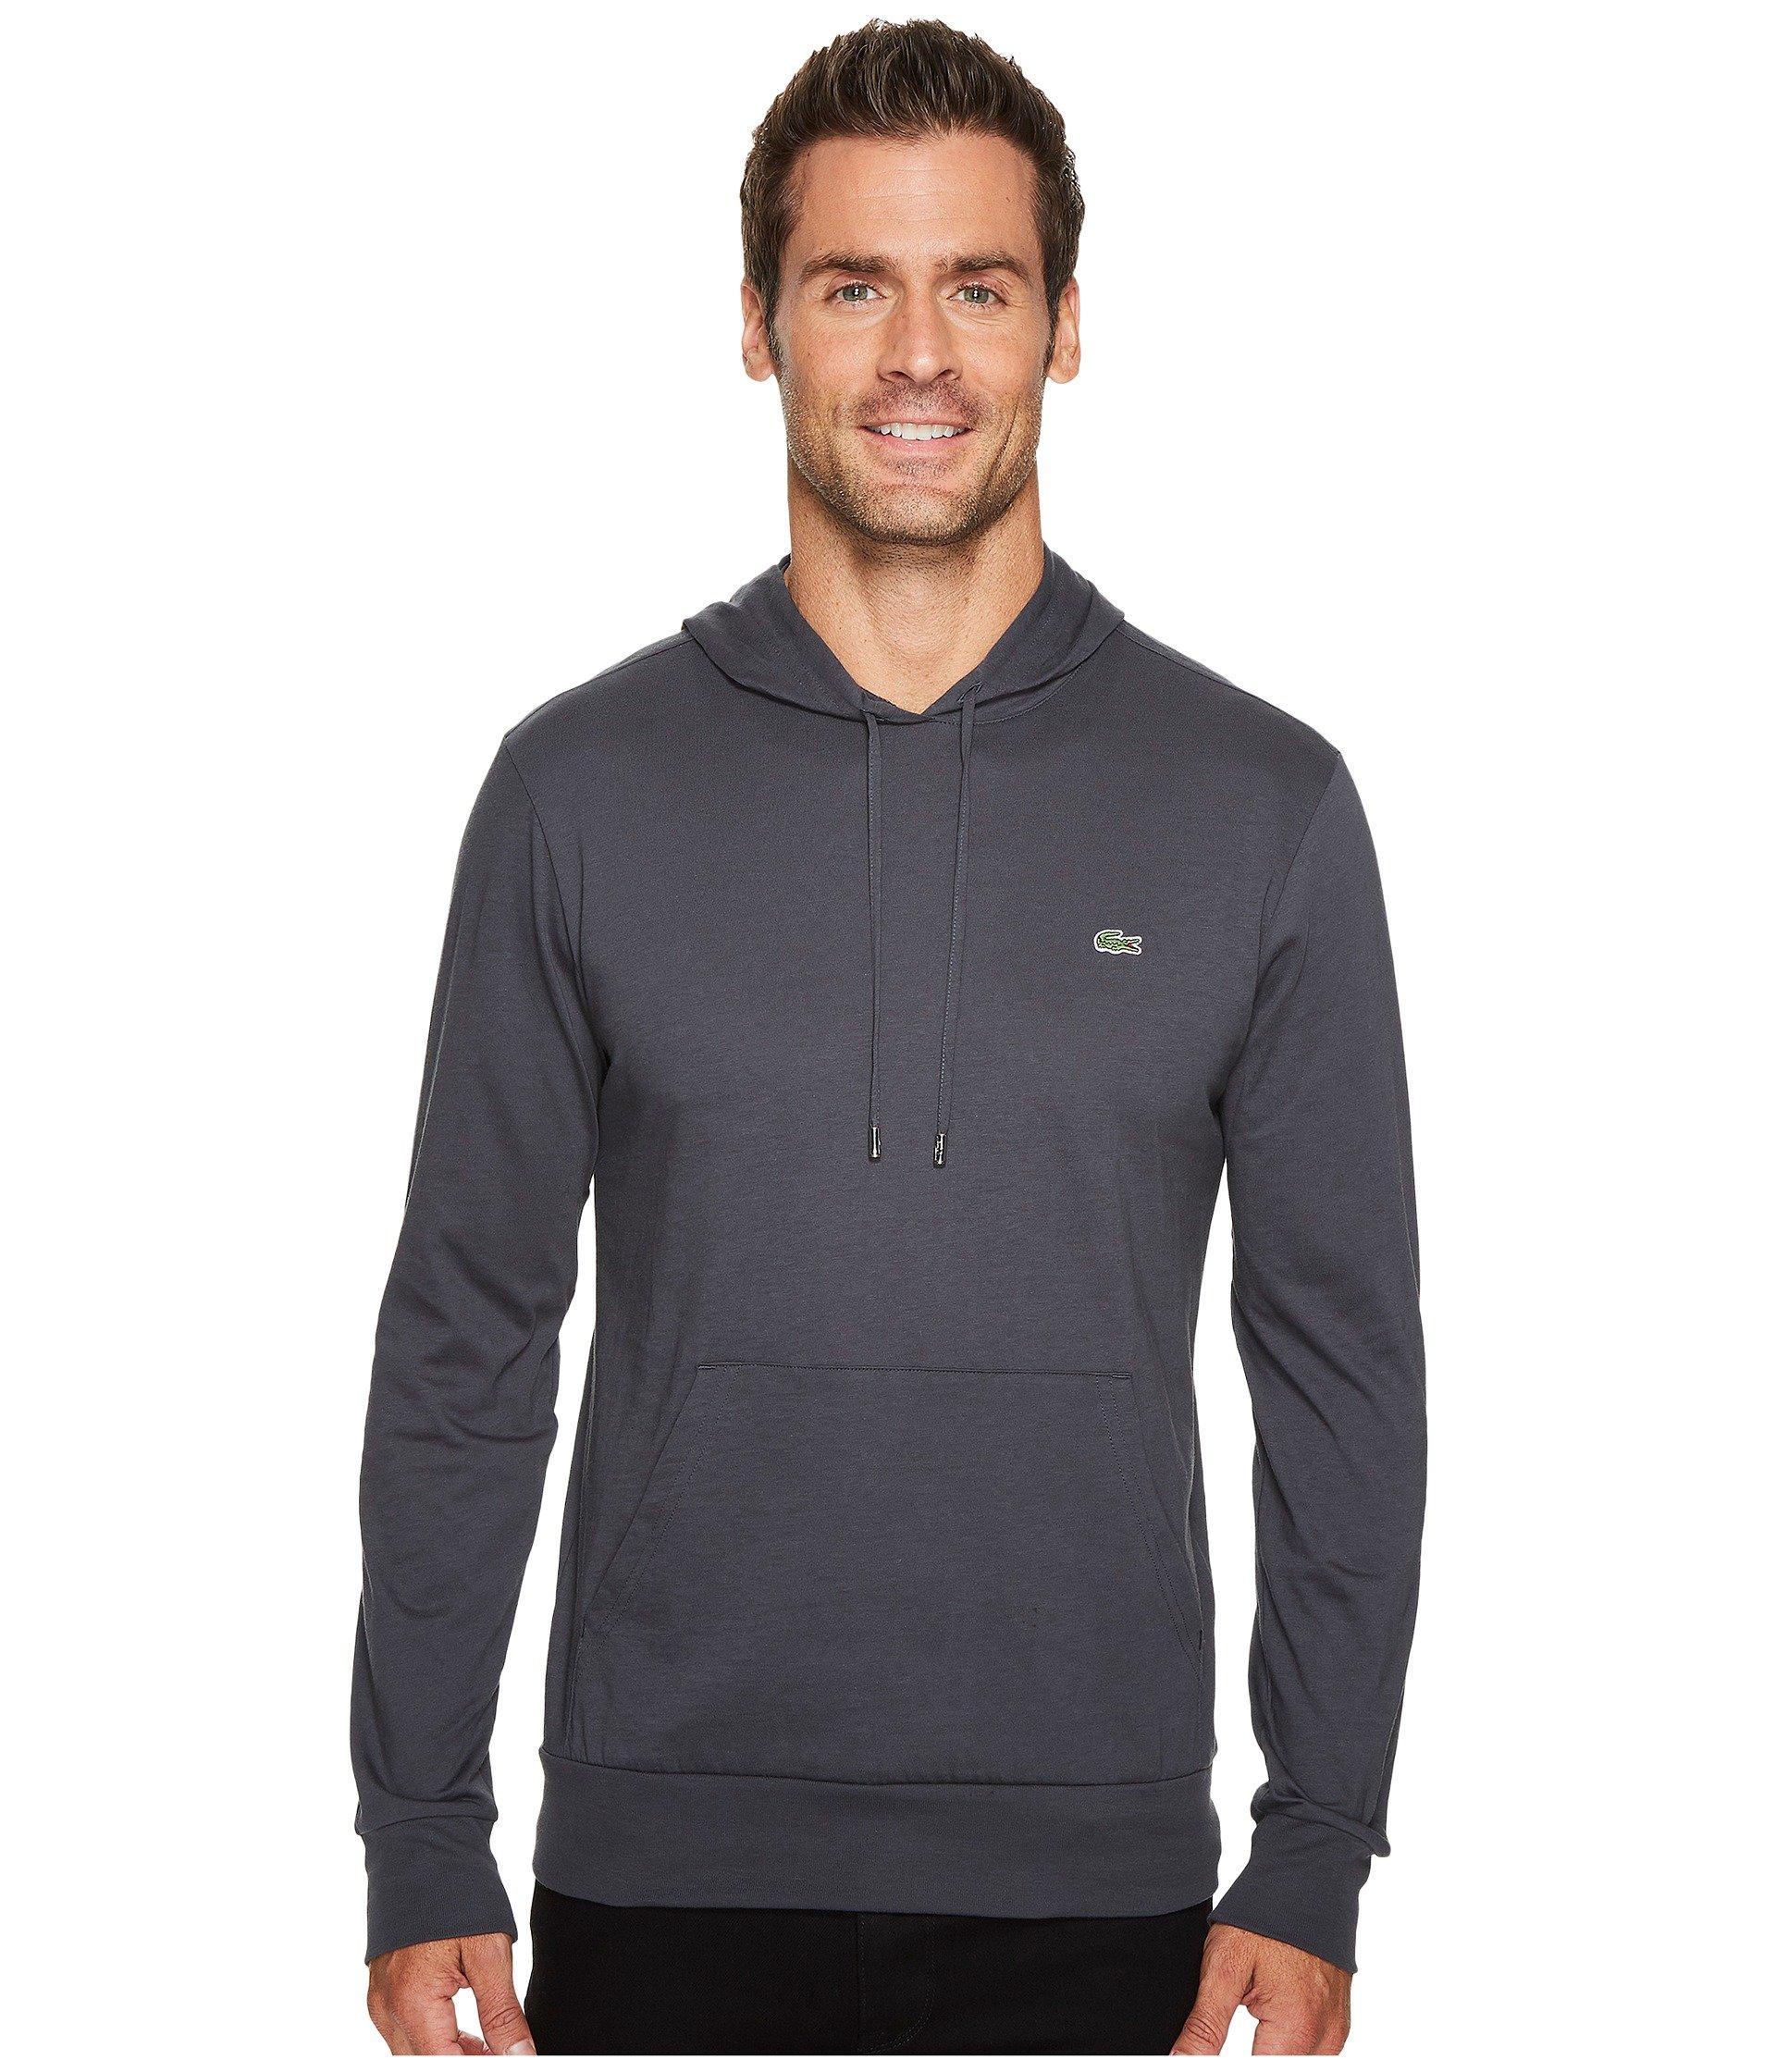 Buzo o Chaqueta Deportiva para Hombre Lacoste Jersey T-Shirt Hoodie  + Lacoste en VeoyCompro.net